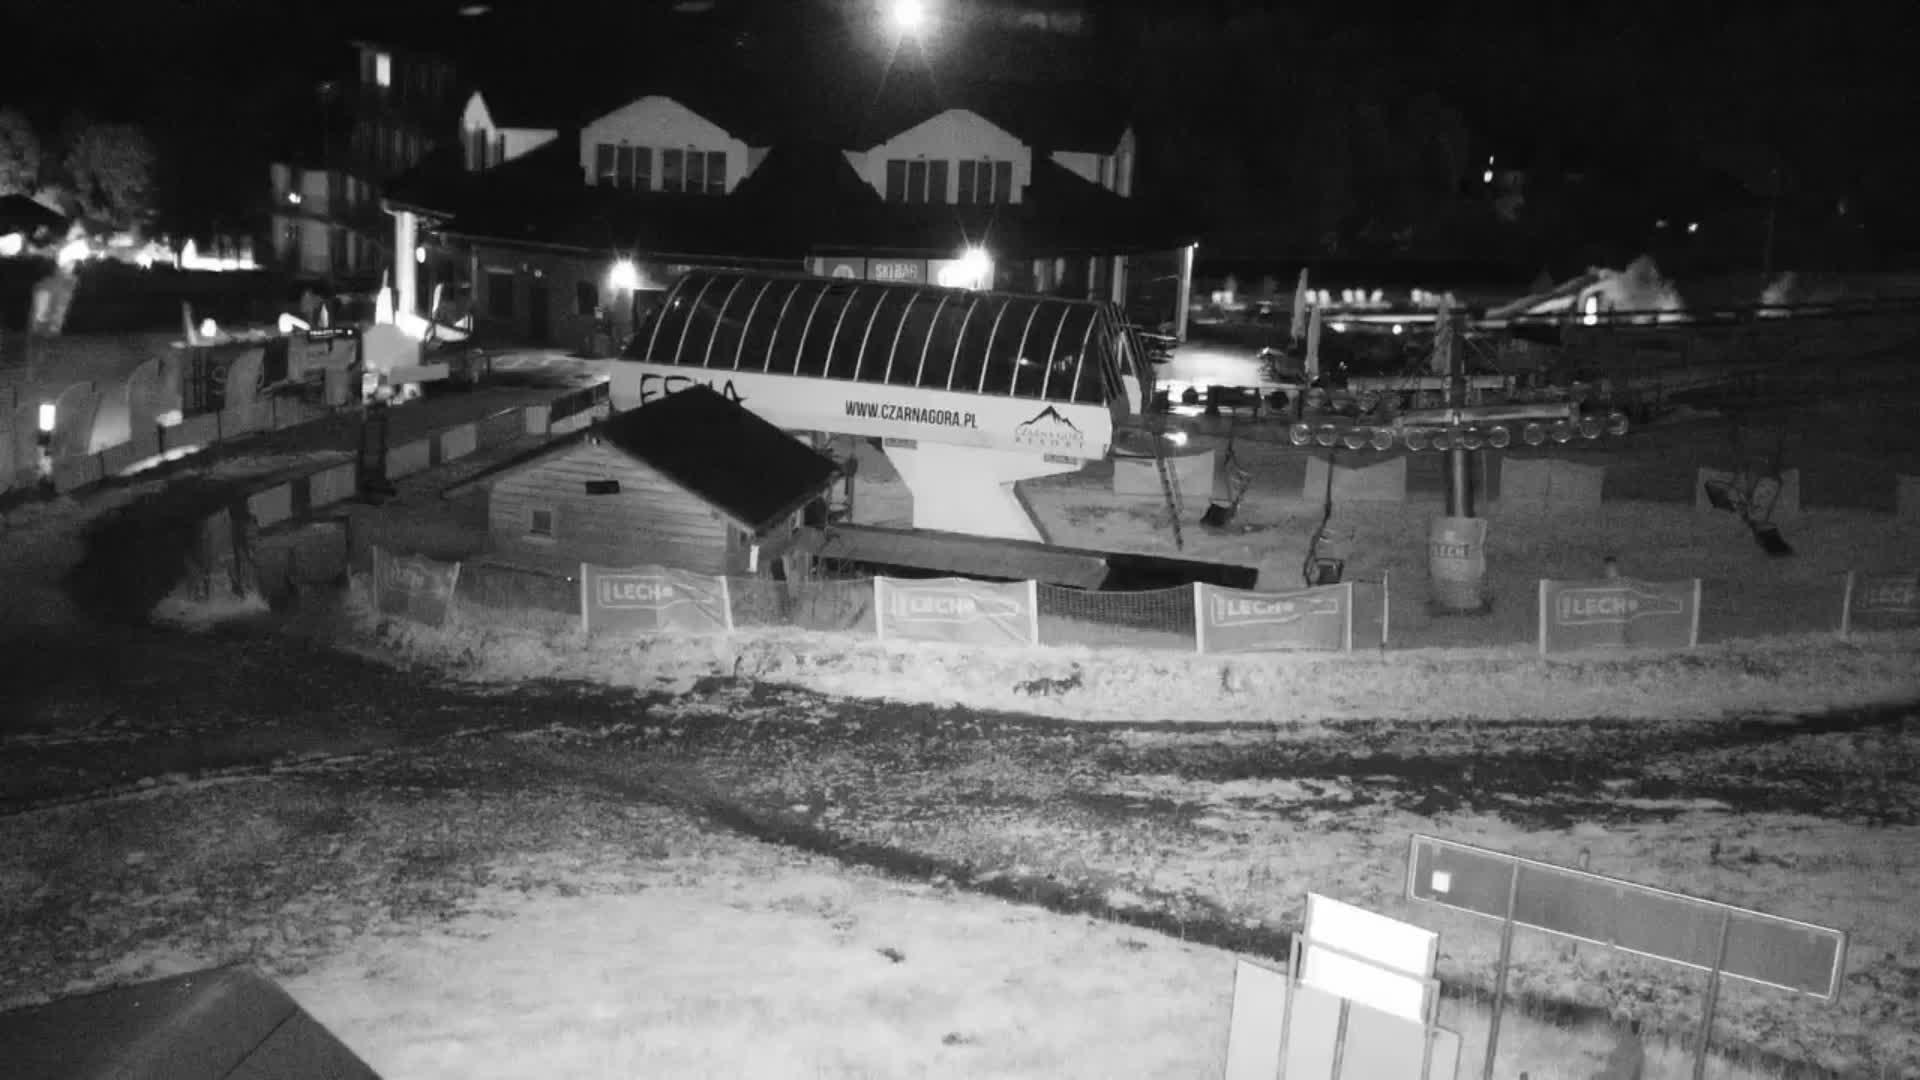 Webcam Skigebiet Czarna Gora cam 4 - Glatzer Schneegebirge